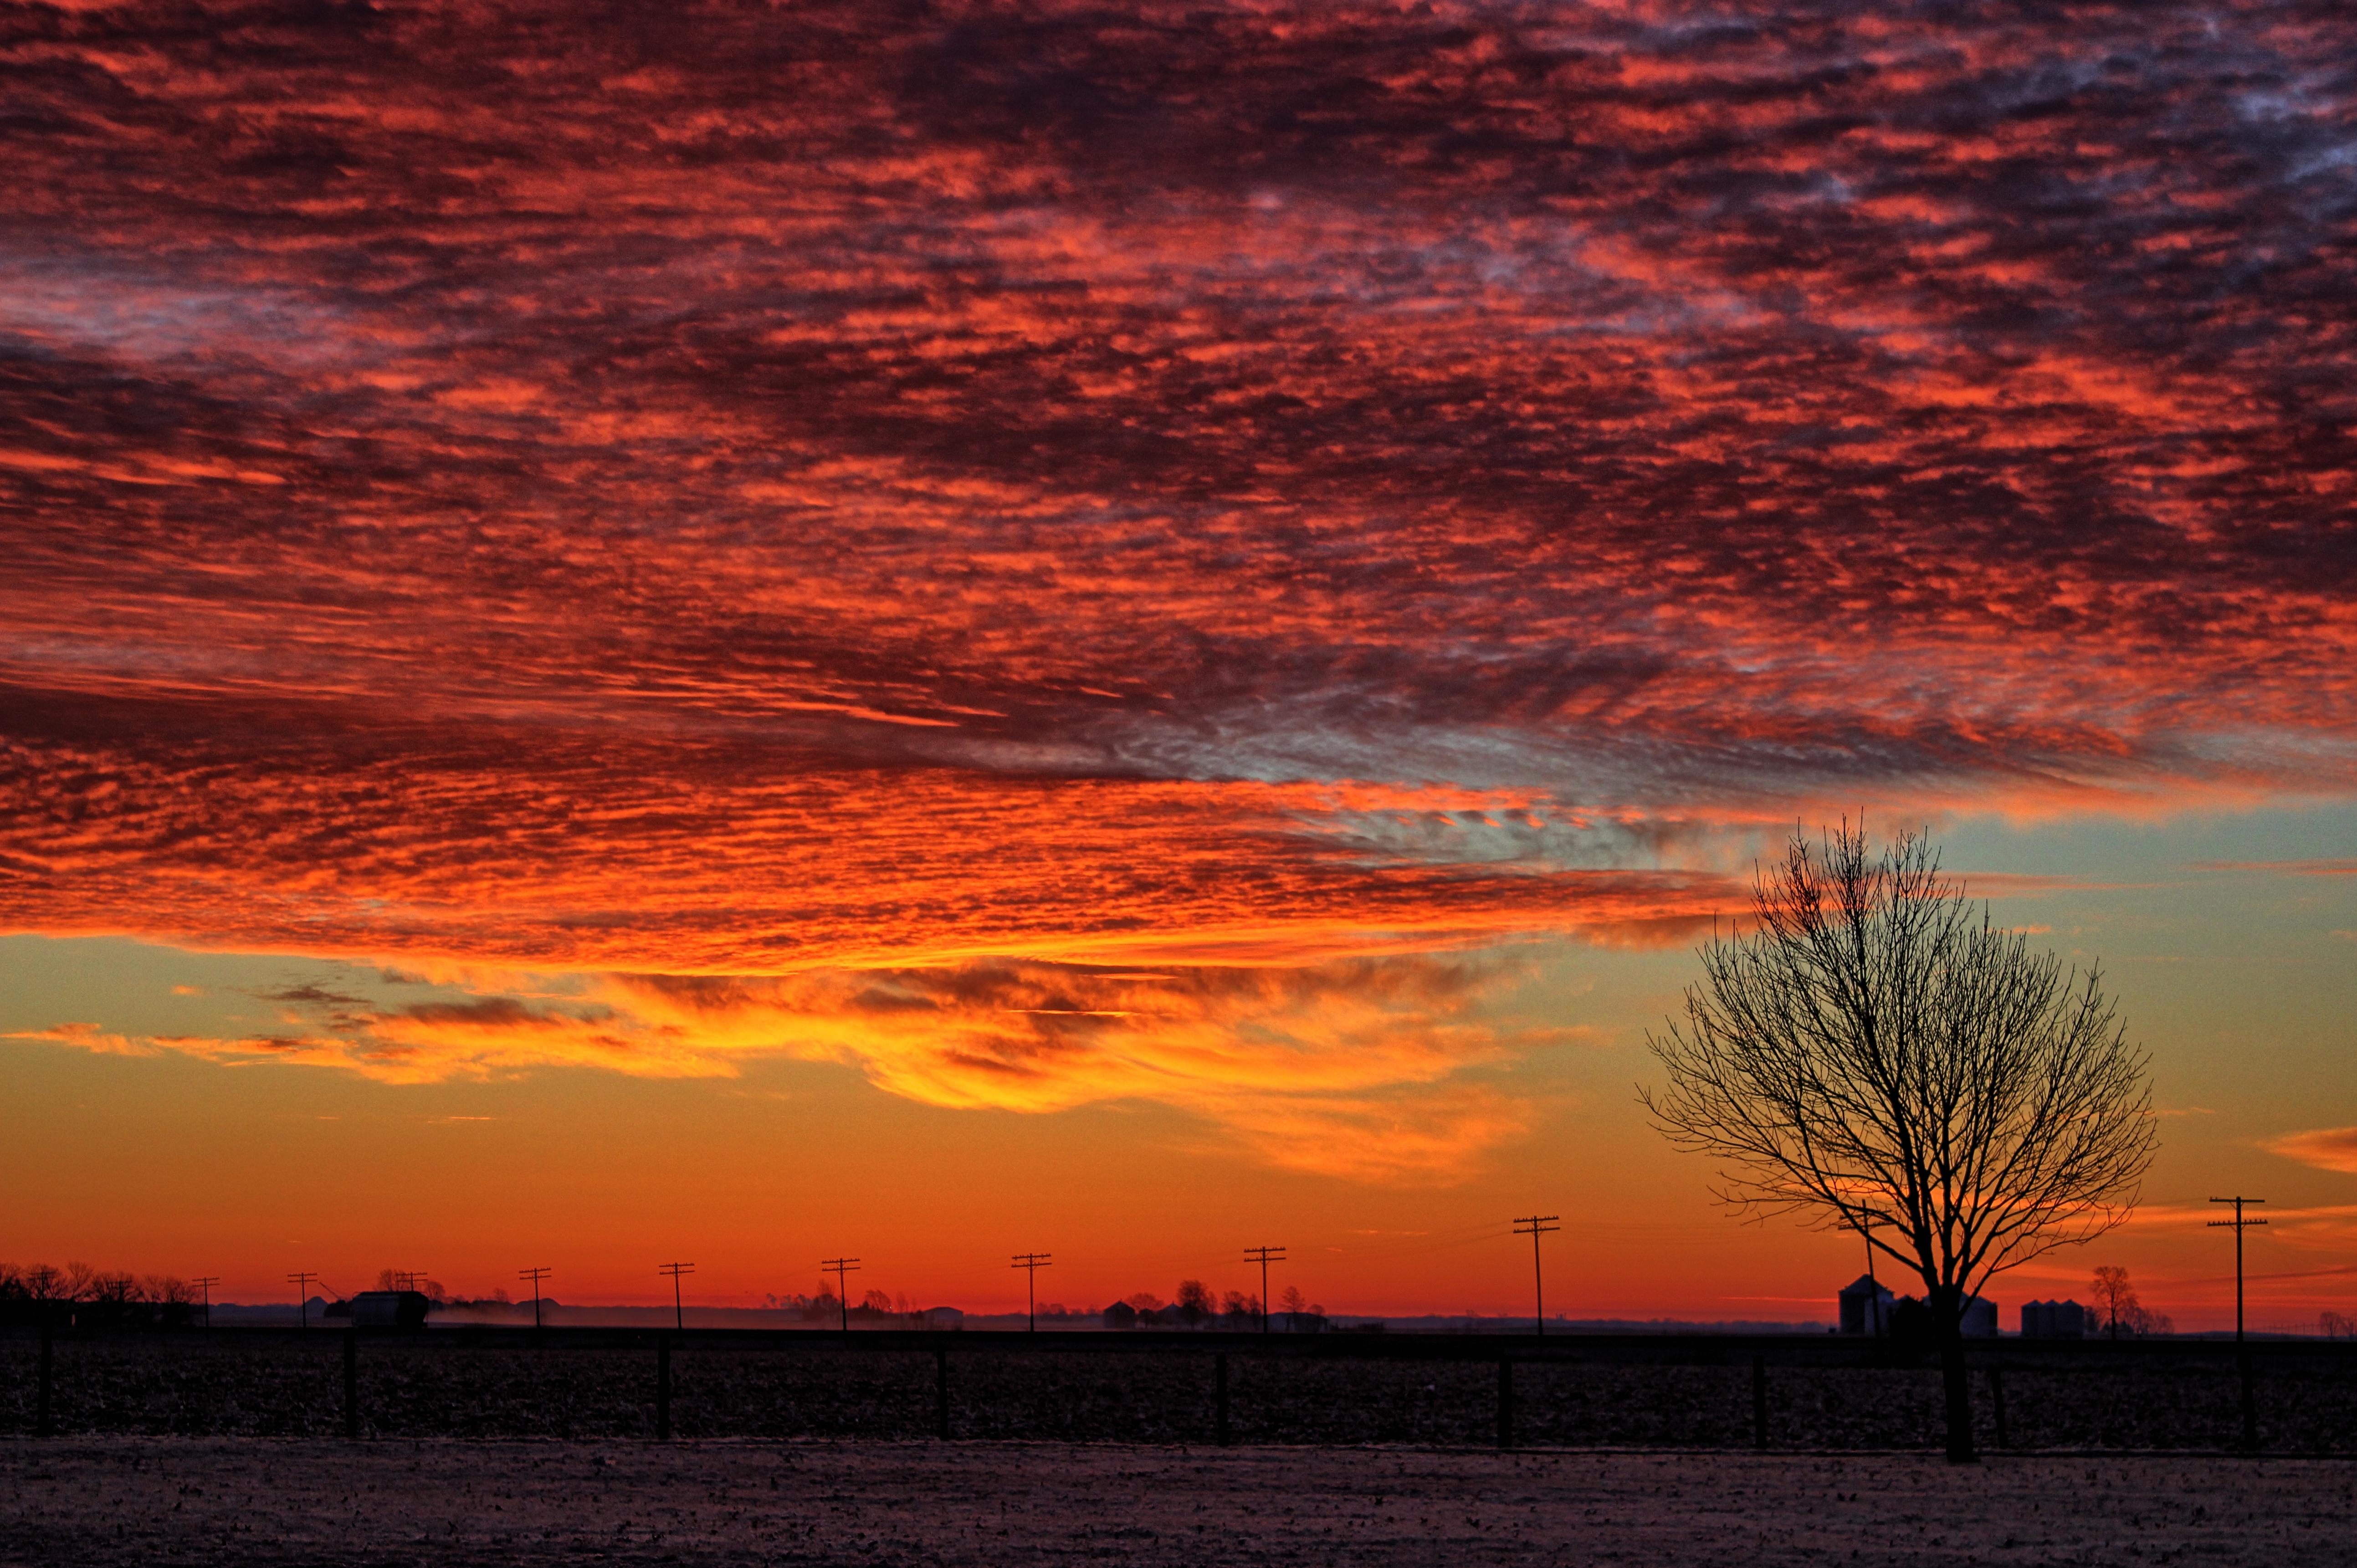 Illinois vermilion county muncie - Cemetery Sunrise Illinois Homer Gar